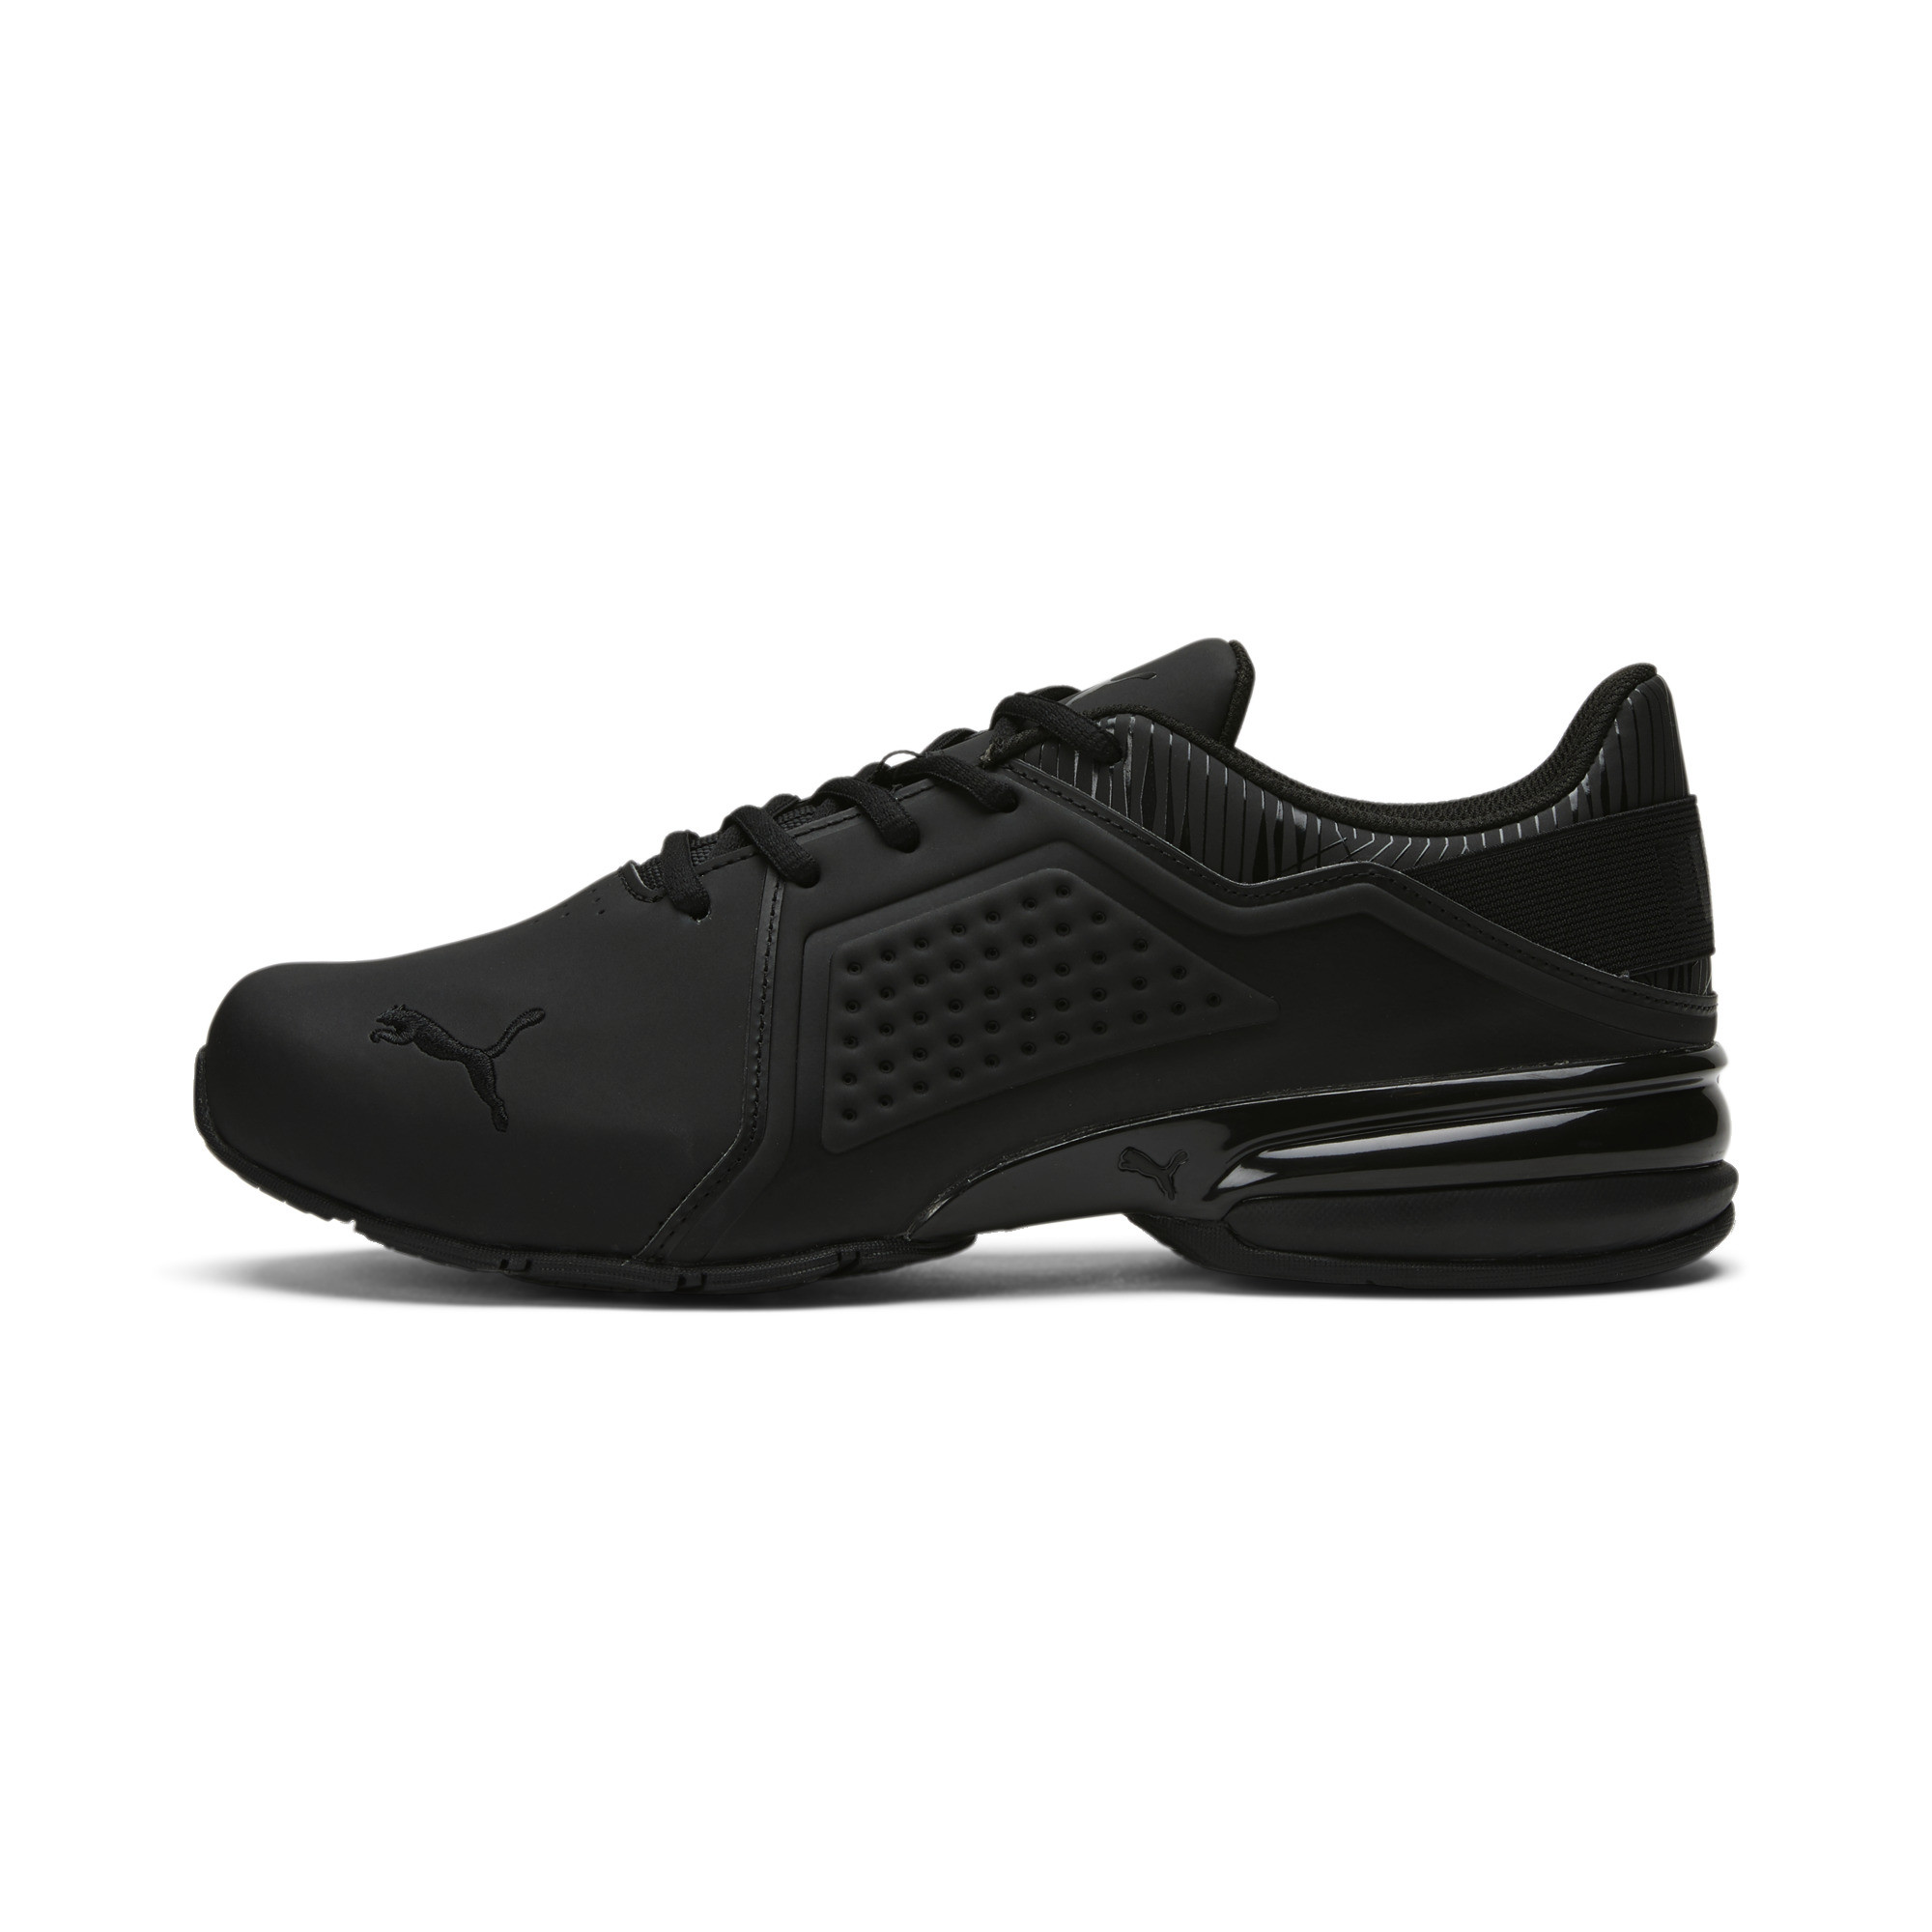 PUMA-Men-039-s-Viz-Runner-Graphic-Sneakers thumbnail 27